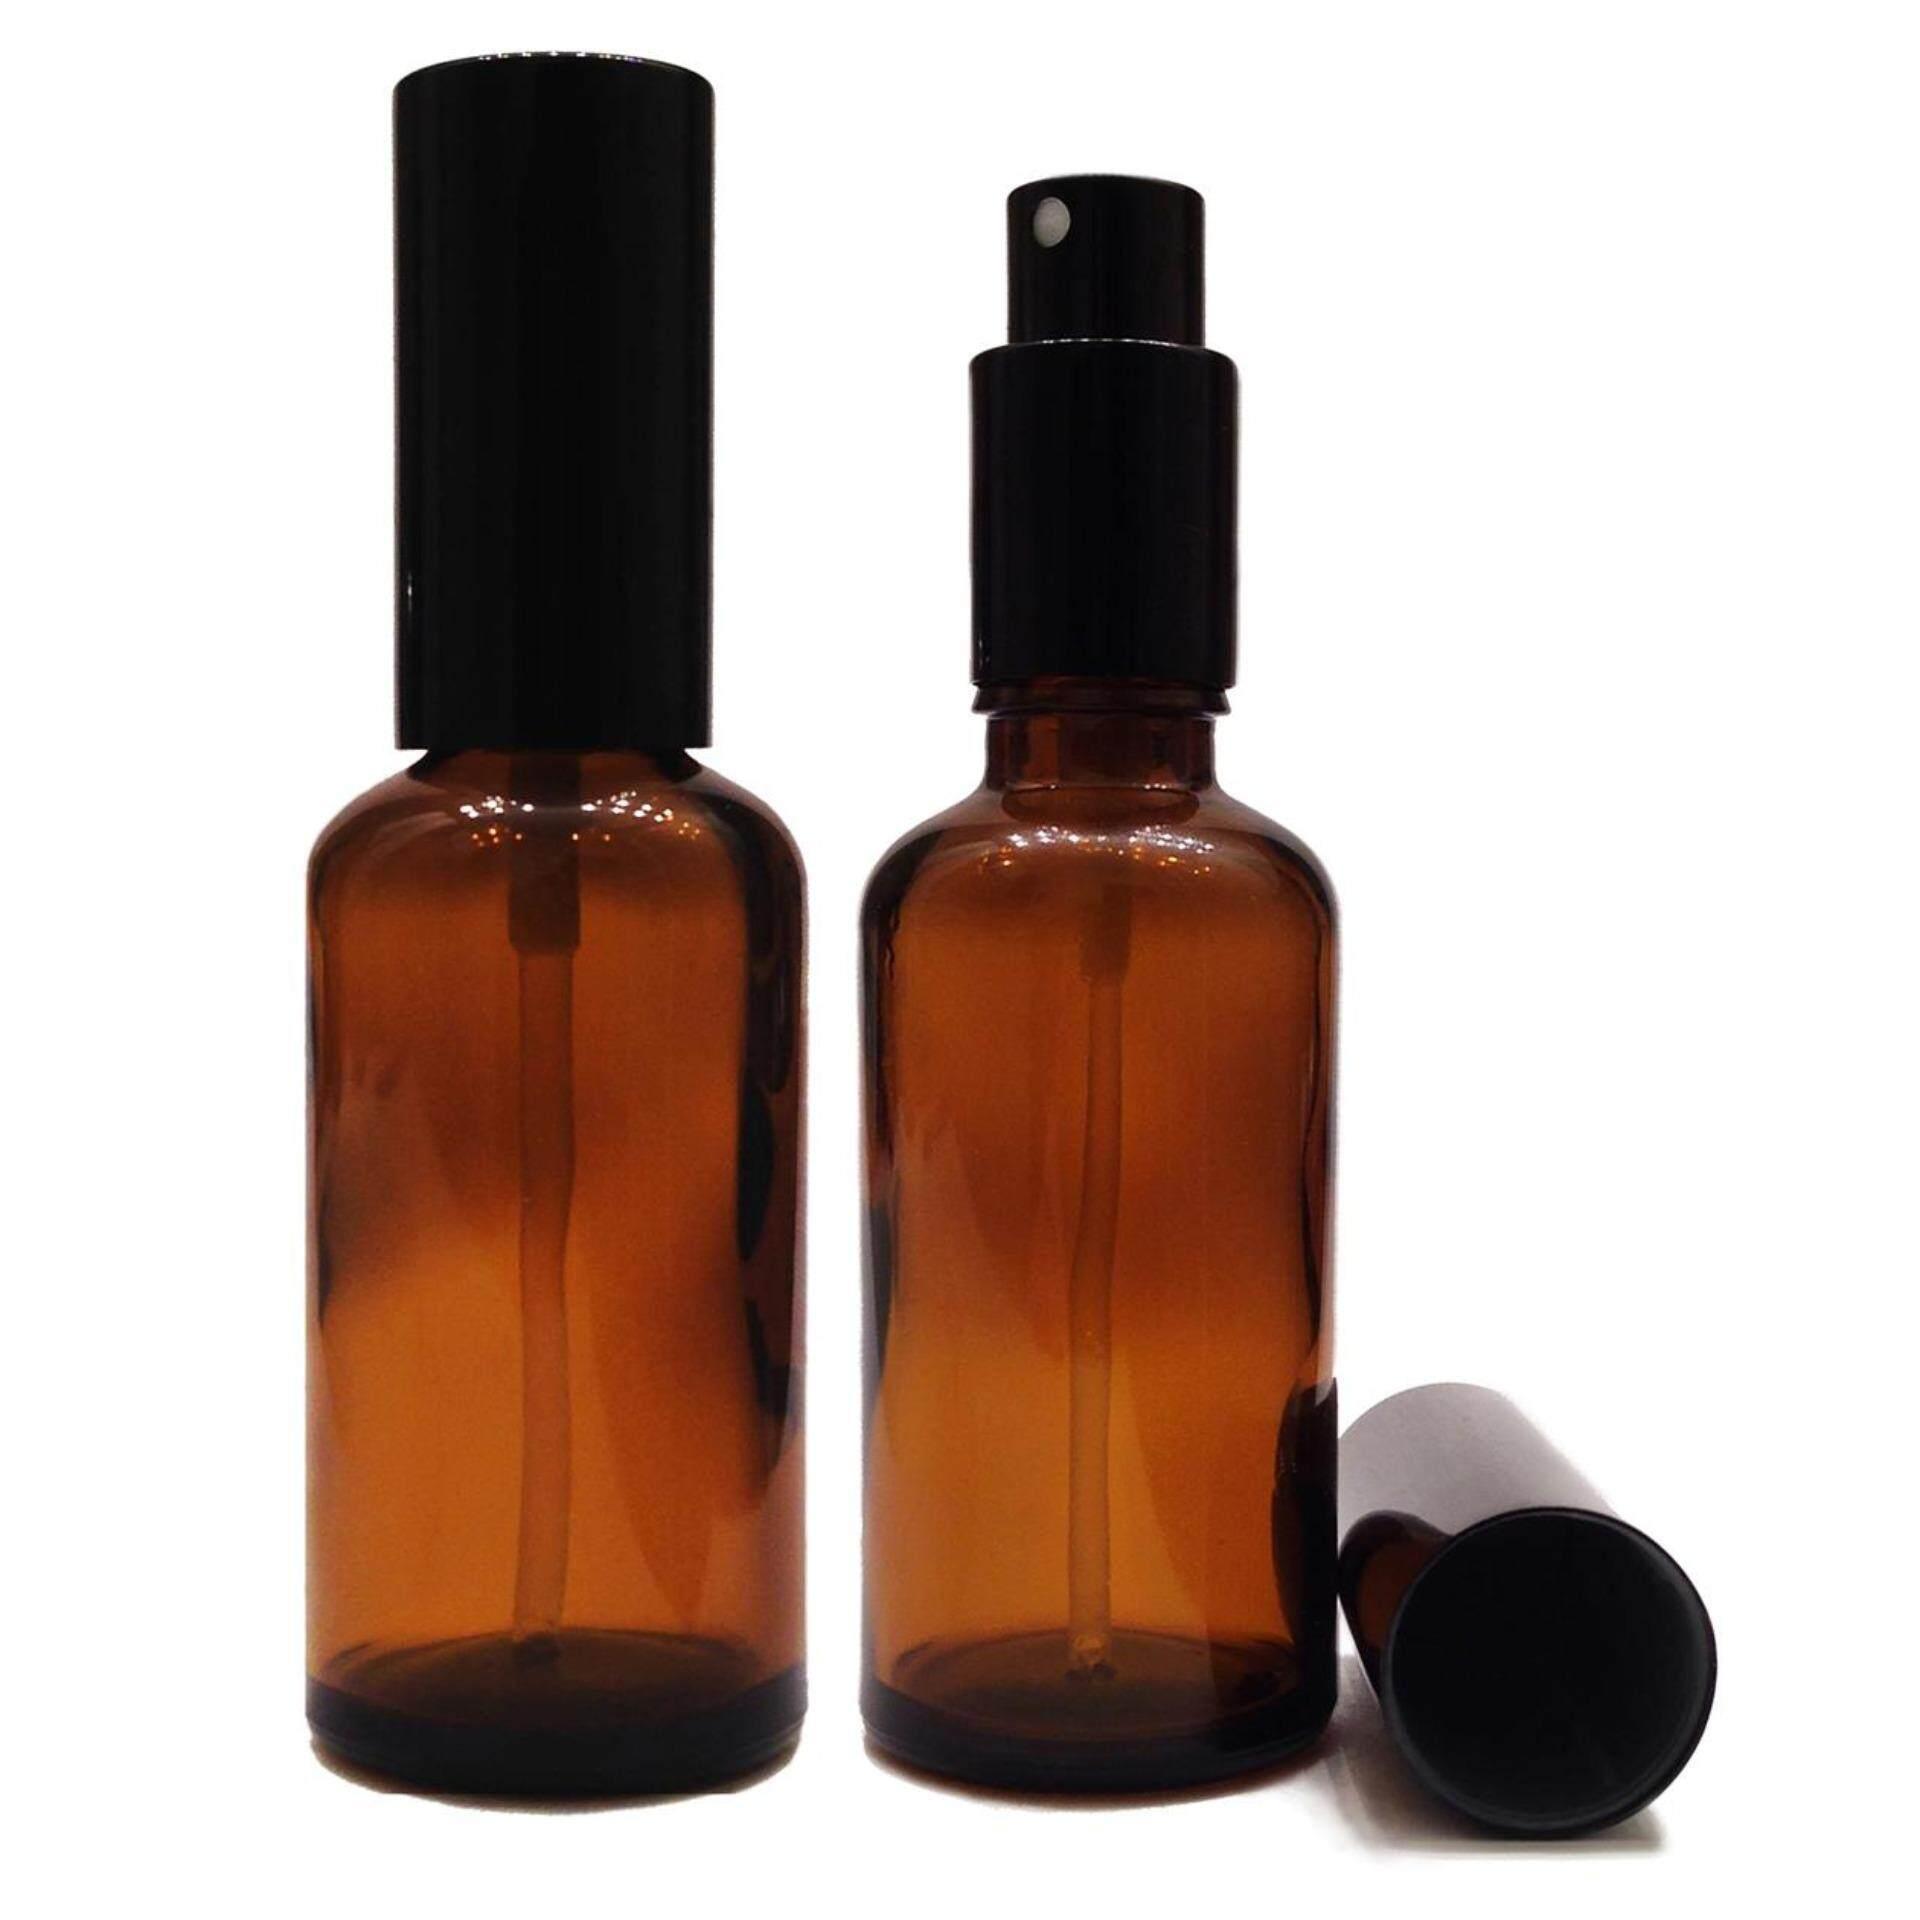 Travel Size Bottles Containers Buy Pot Cream Kosmetik 15ml 1 Pcs 50ml Bottle Mist Spray Sprayer Pump Amber Glass For Essential Oil Cosmetics